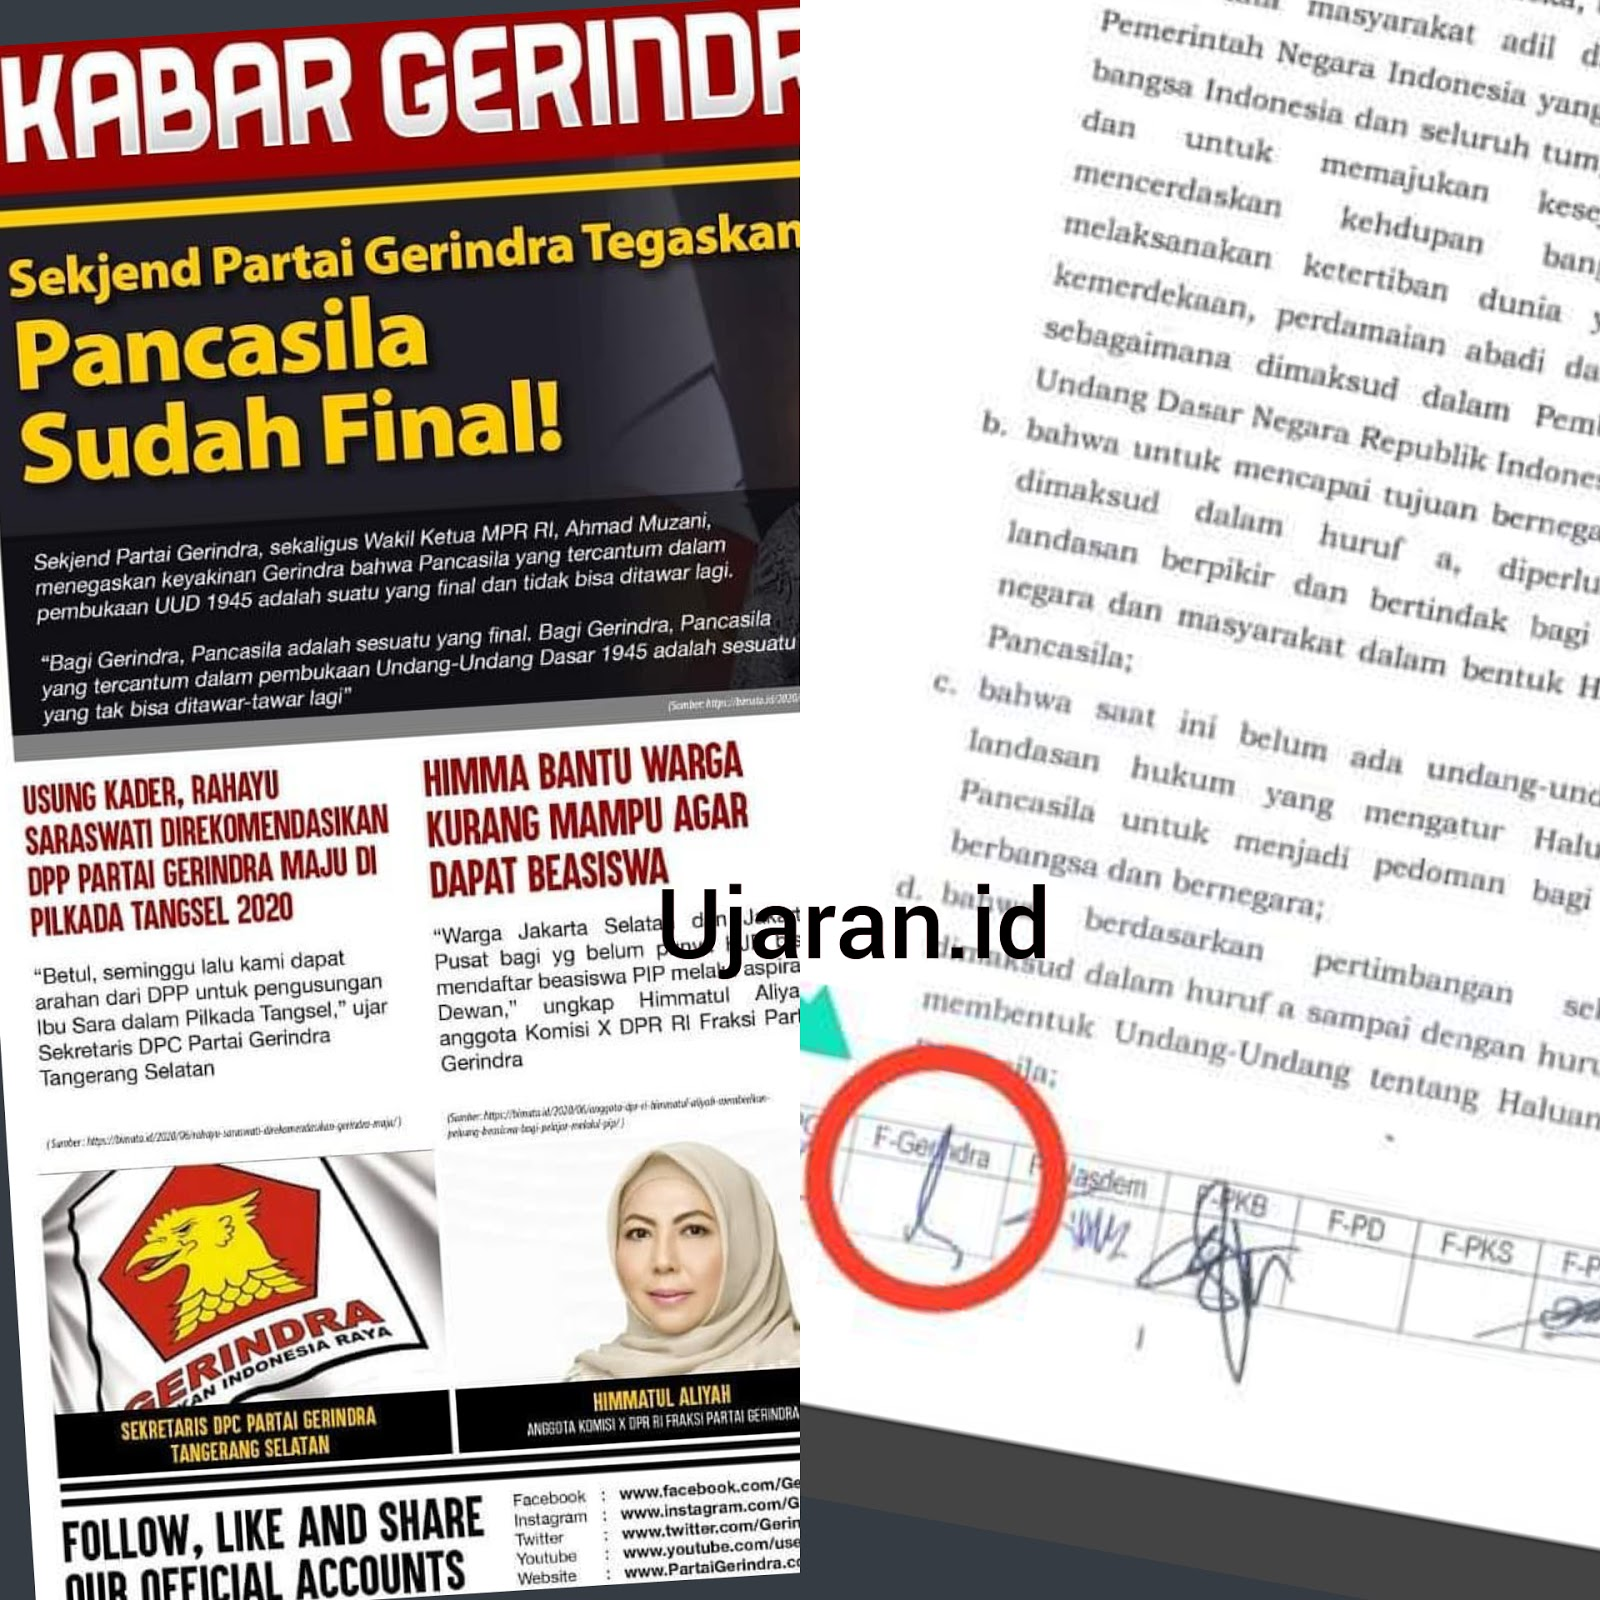 "Di Medsos Teriak ""Pancasila Final"", di Senayan Tanda Tangan"